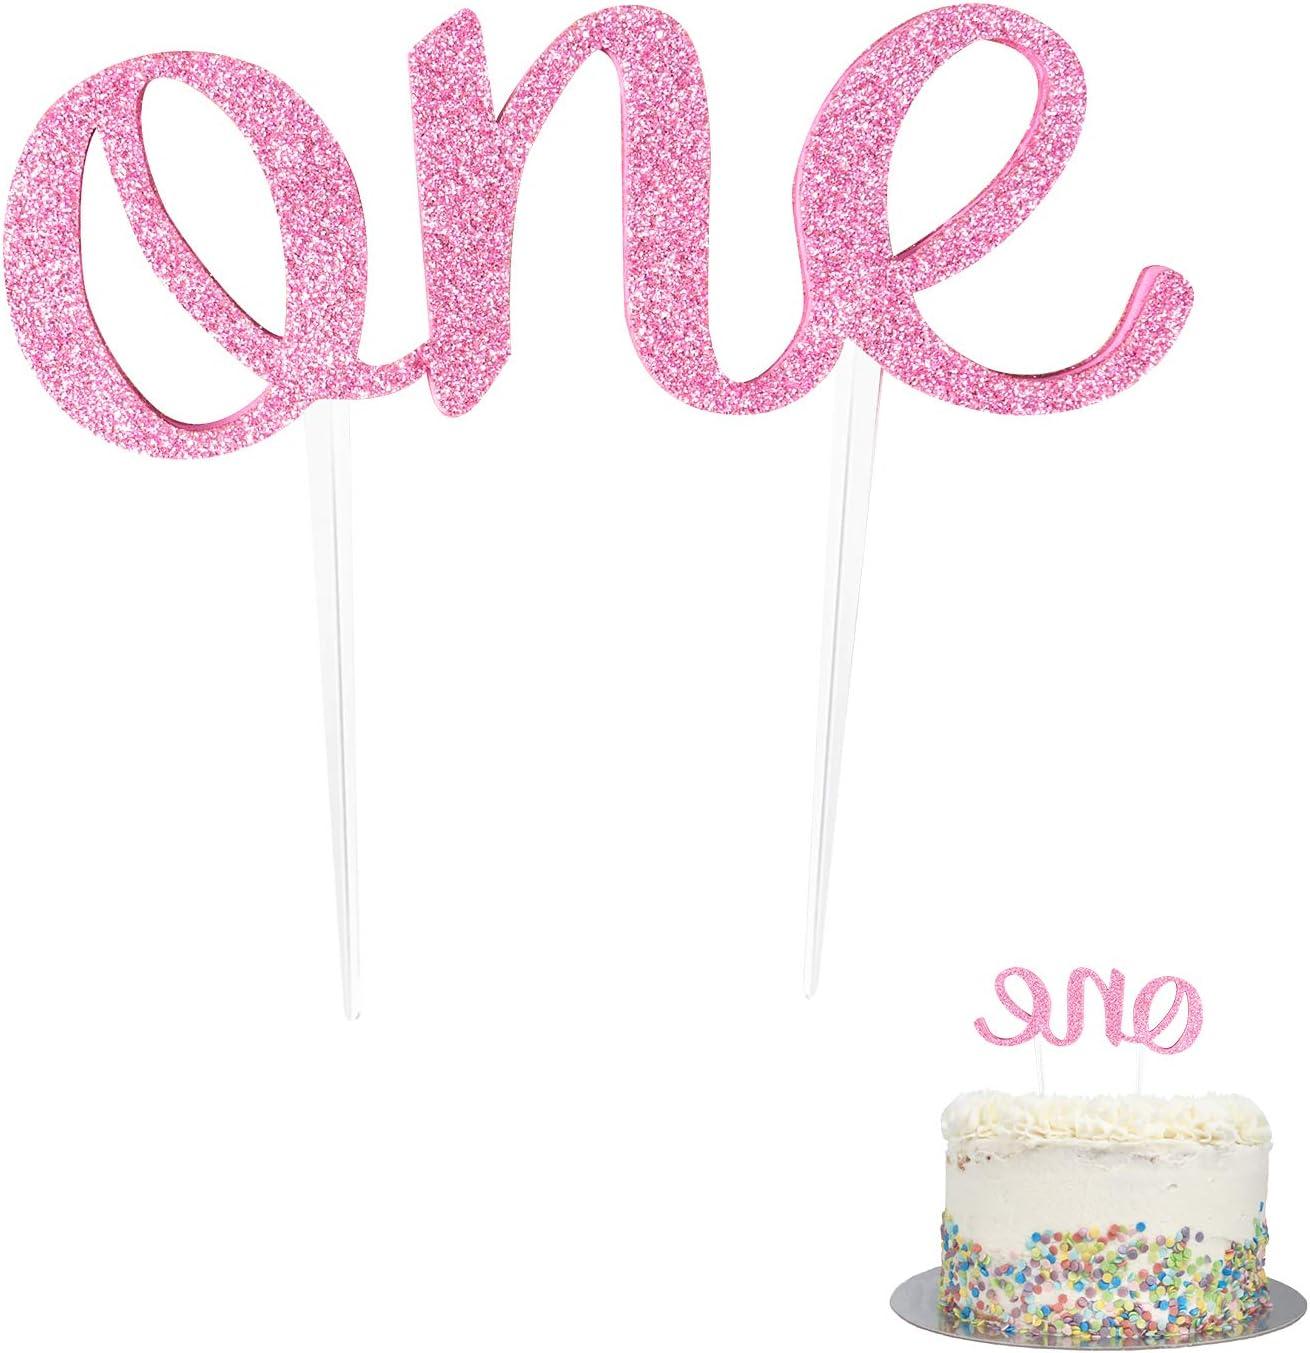 First Birthday Cake Topper 1st Birthday Topper Double Cake Topper Olabi 1st Birthday One Cake Topper One Year Old Cake Topper First anniversary Cake Topper Baby Shower Cake Topper Decorations Pink